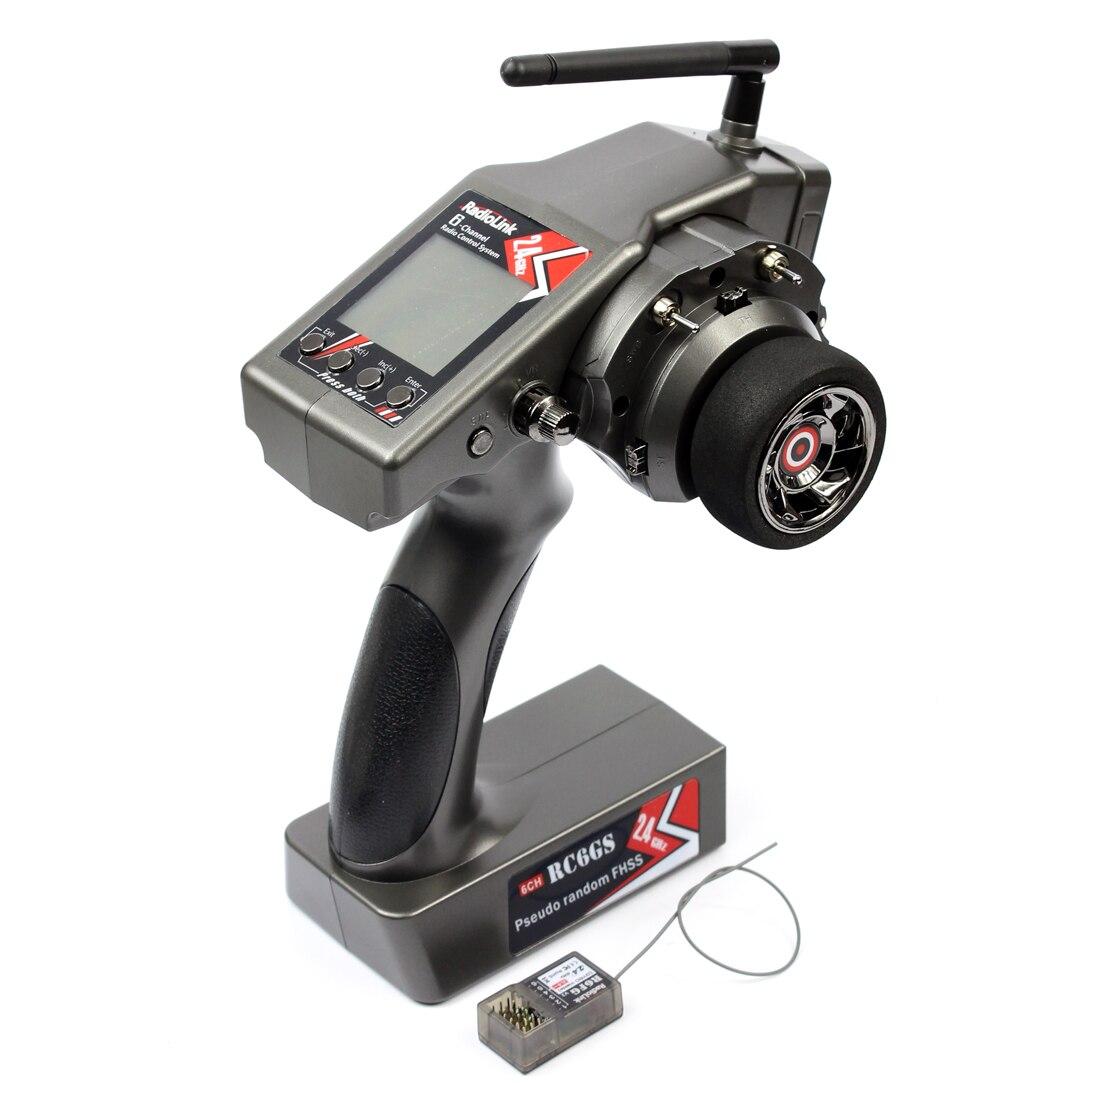 RadioLink RC6GS G 2,4g 6CH transmisor + R6FG Gyro receptor interior RX para Rc Racing Car Control remoto para RC Boat M 400 m distancia